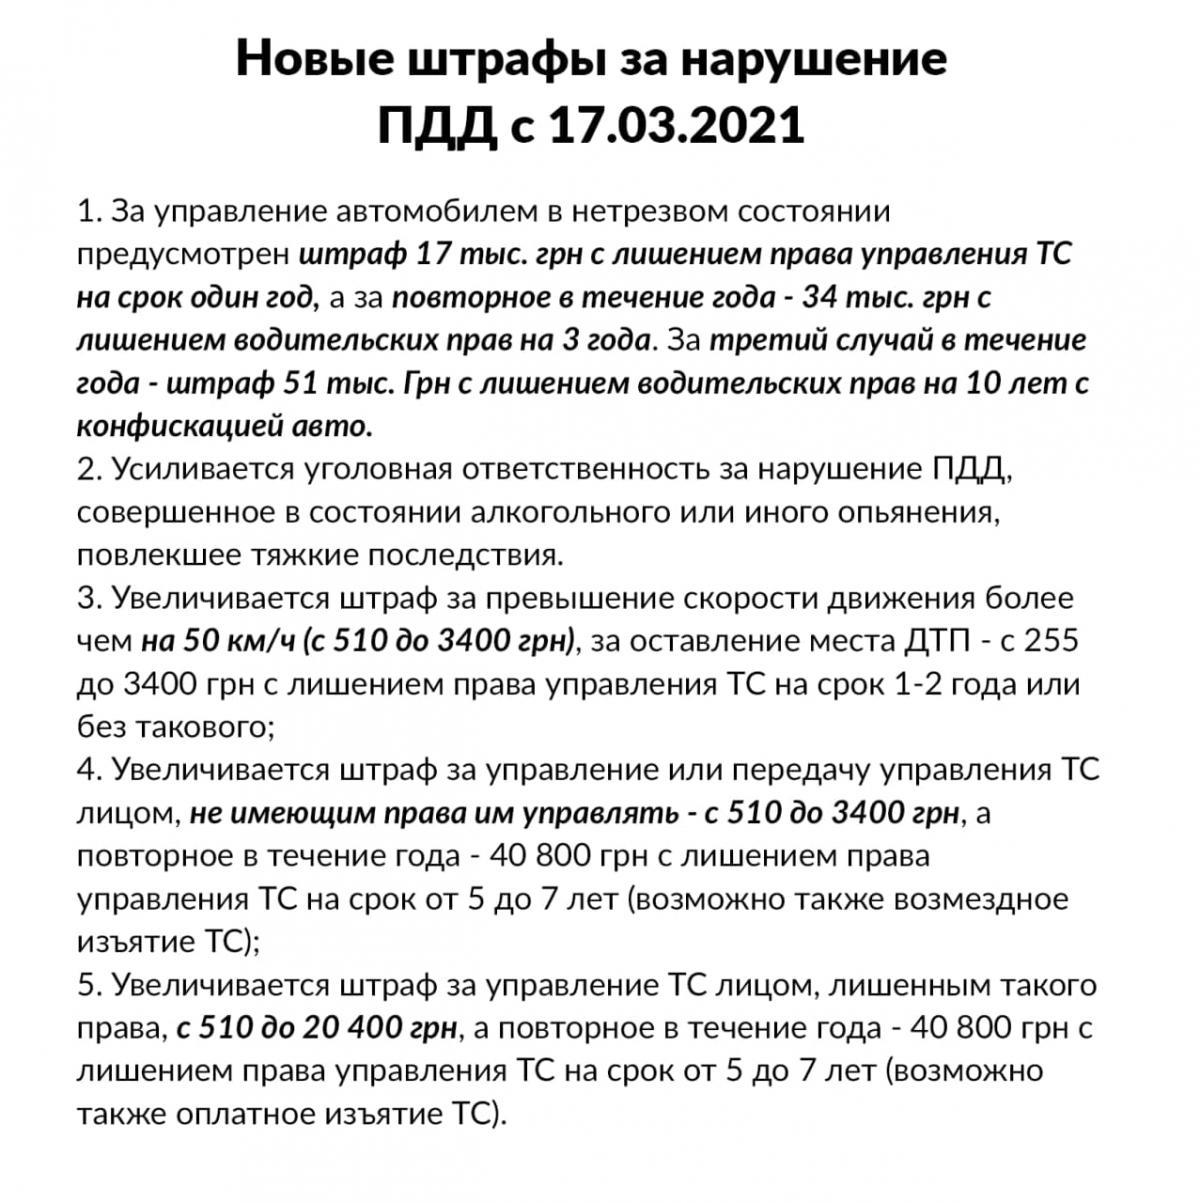 фото Perepichka News